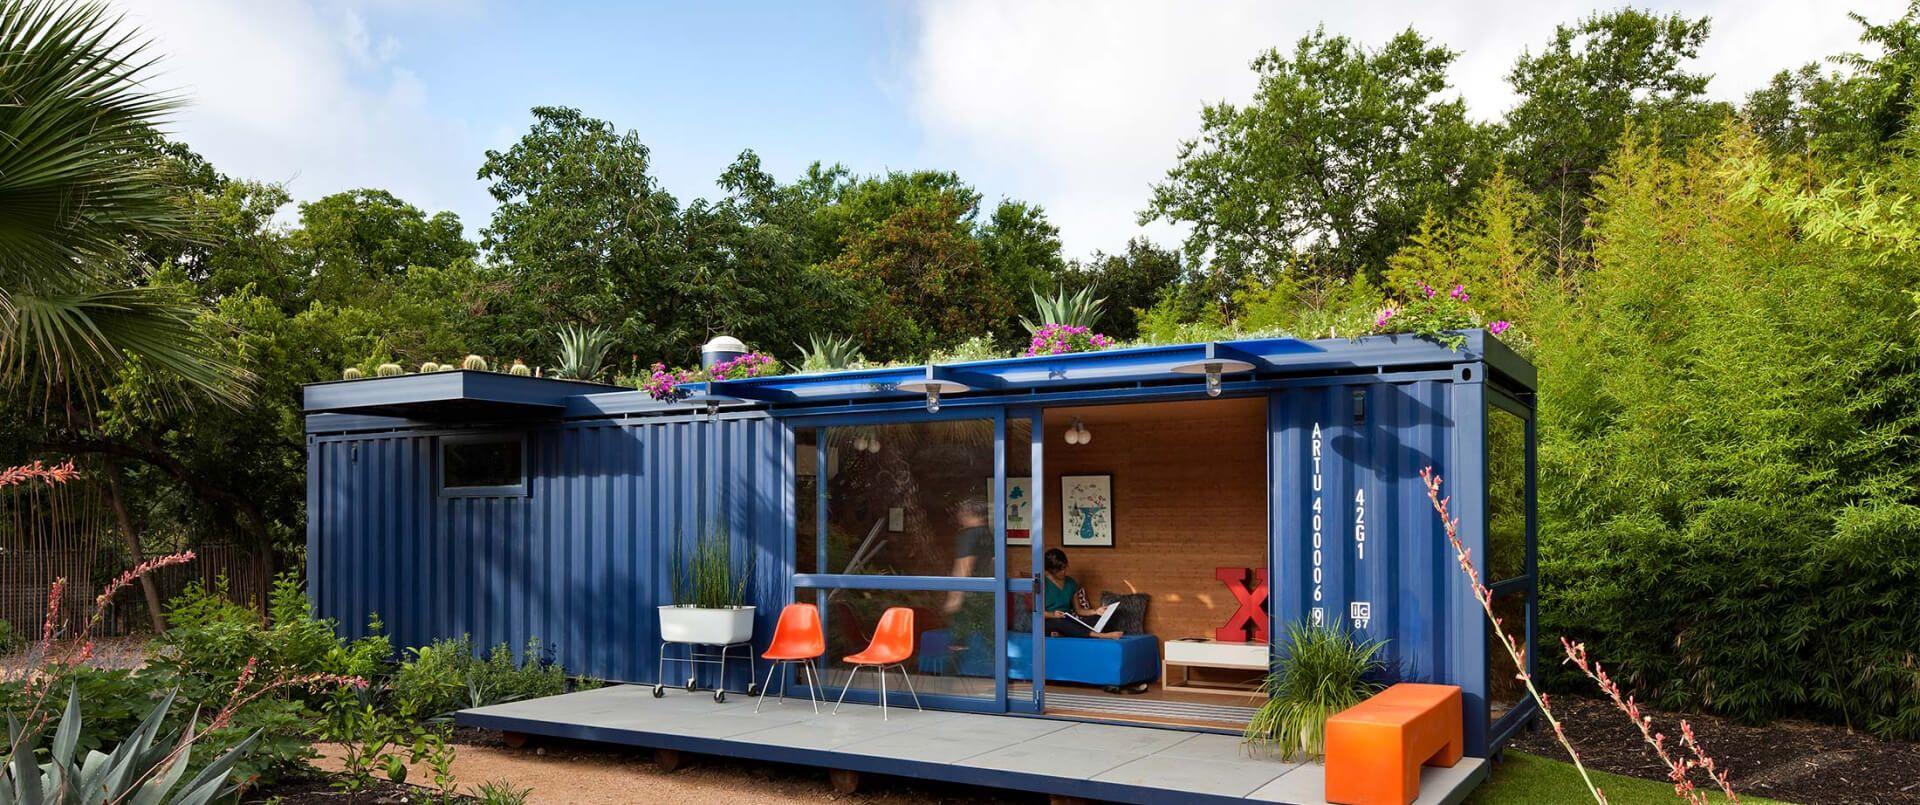 Park Art|My WordPress Blog_Shipping Container Homes Orlando Florida